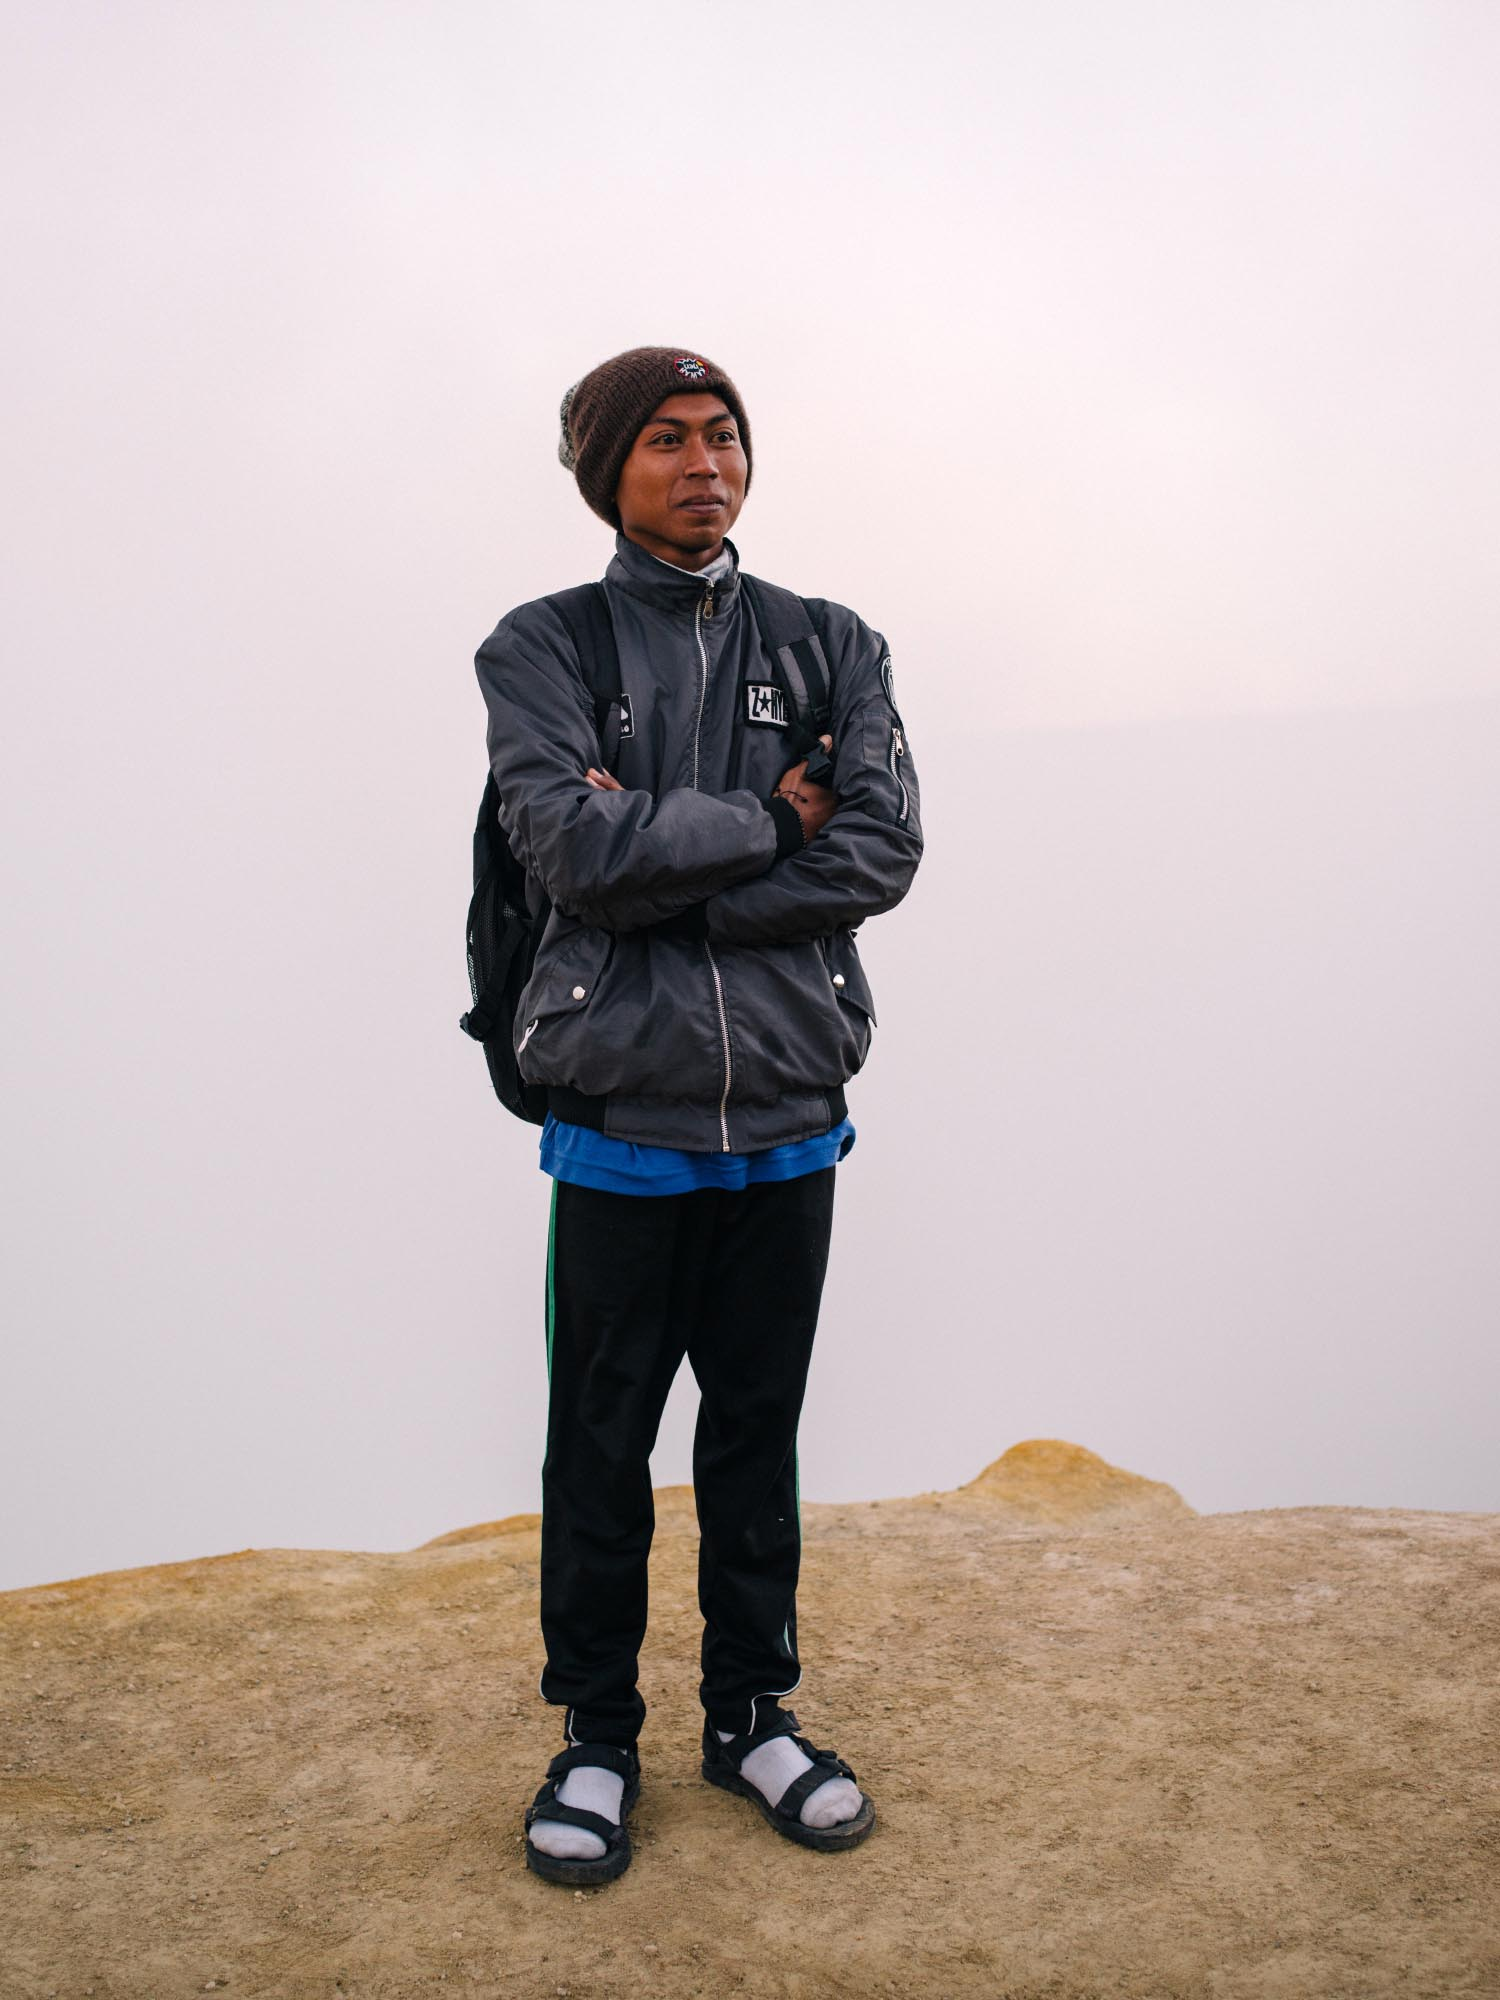 That's a 300 feet vertical drop behind him hidden in clouds…